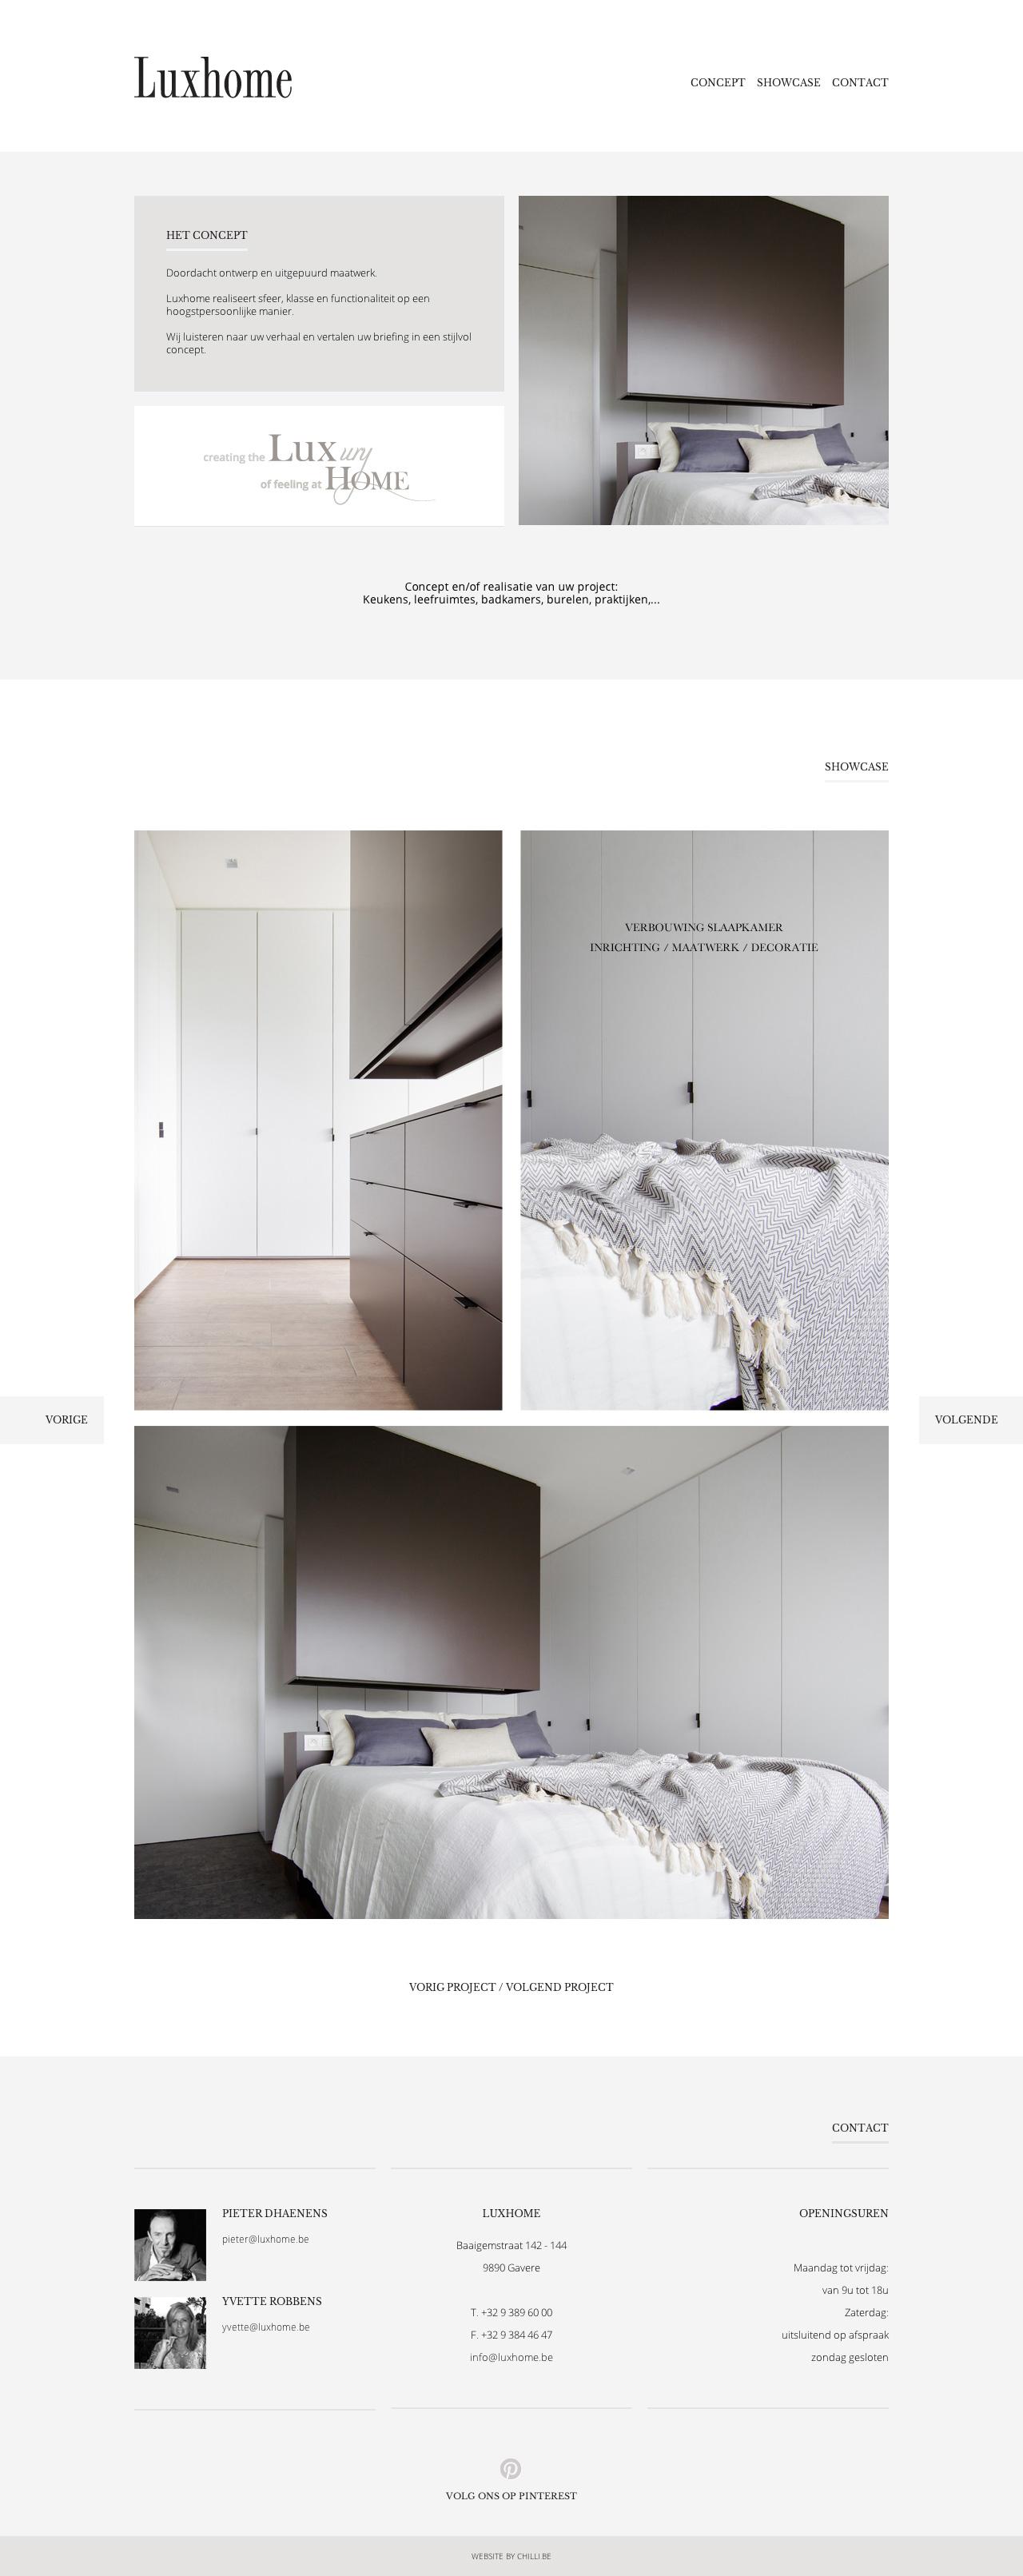 Luxhome Website Screenshot